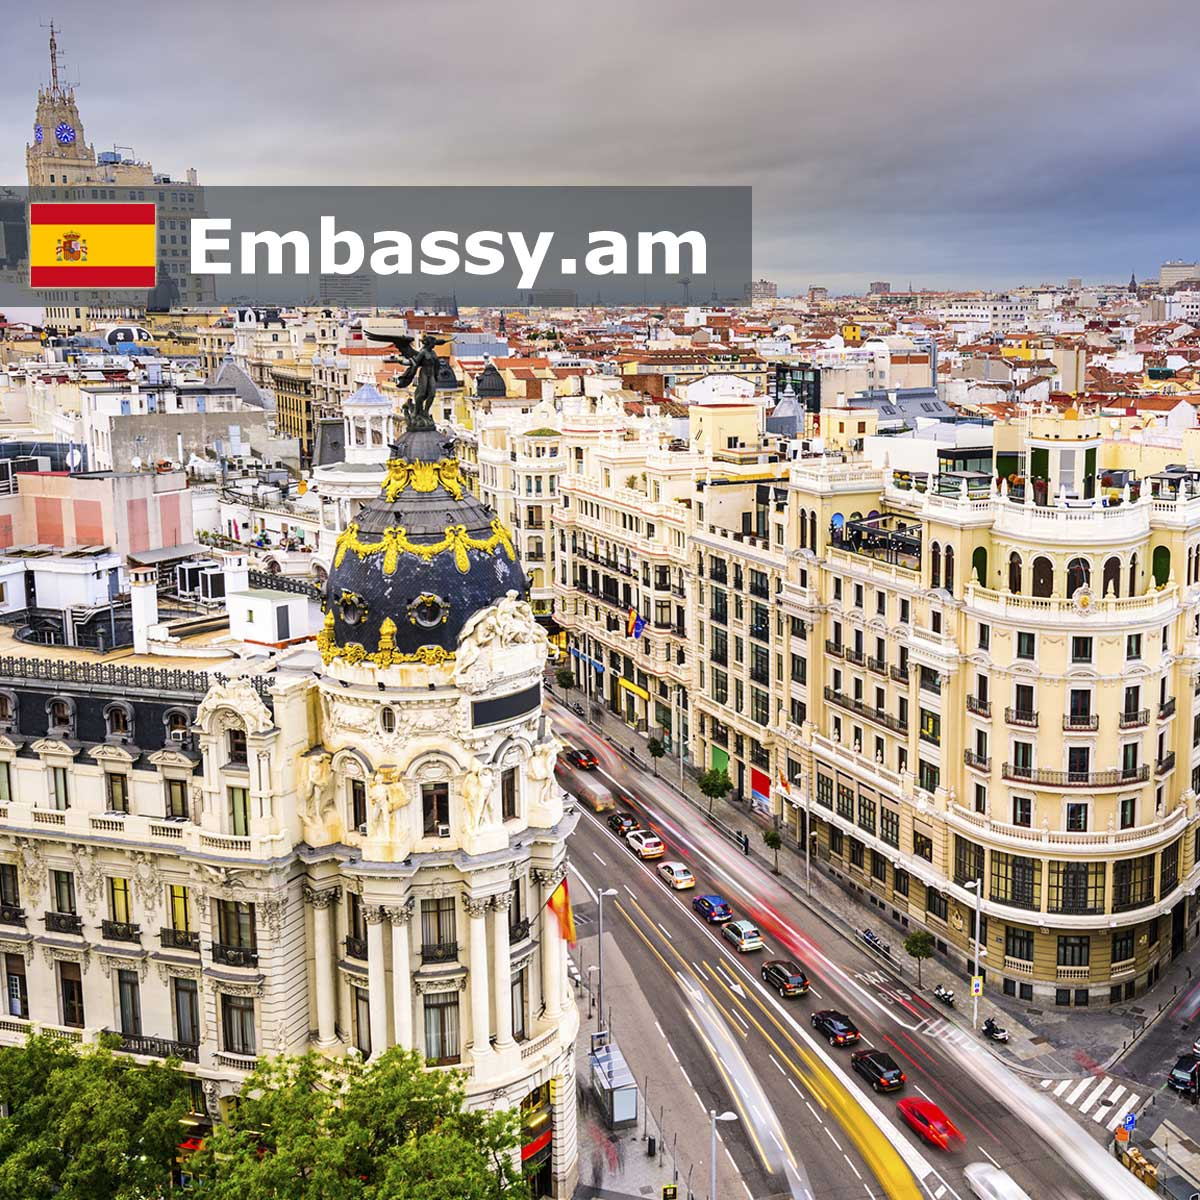 Отели в Испании - Embassy.am